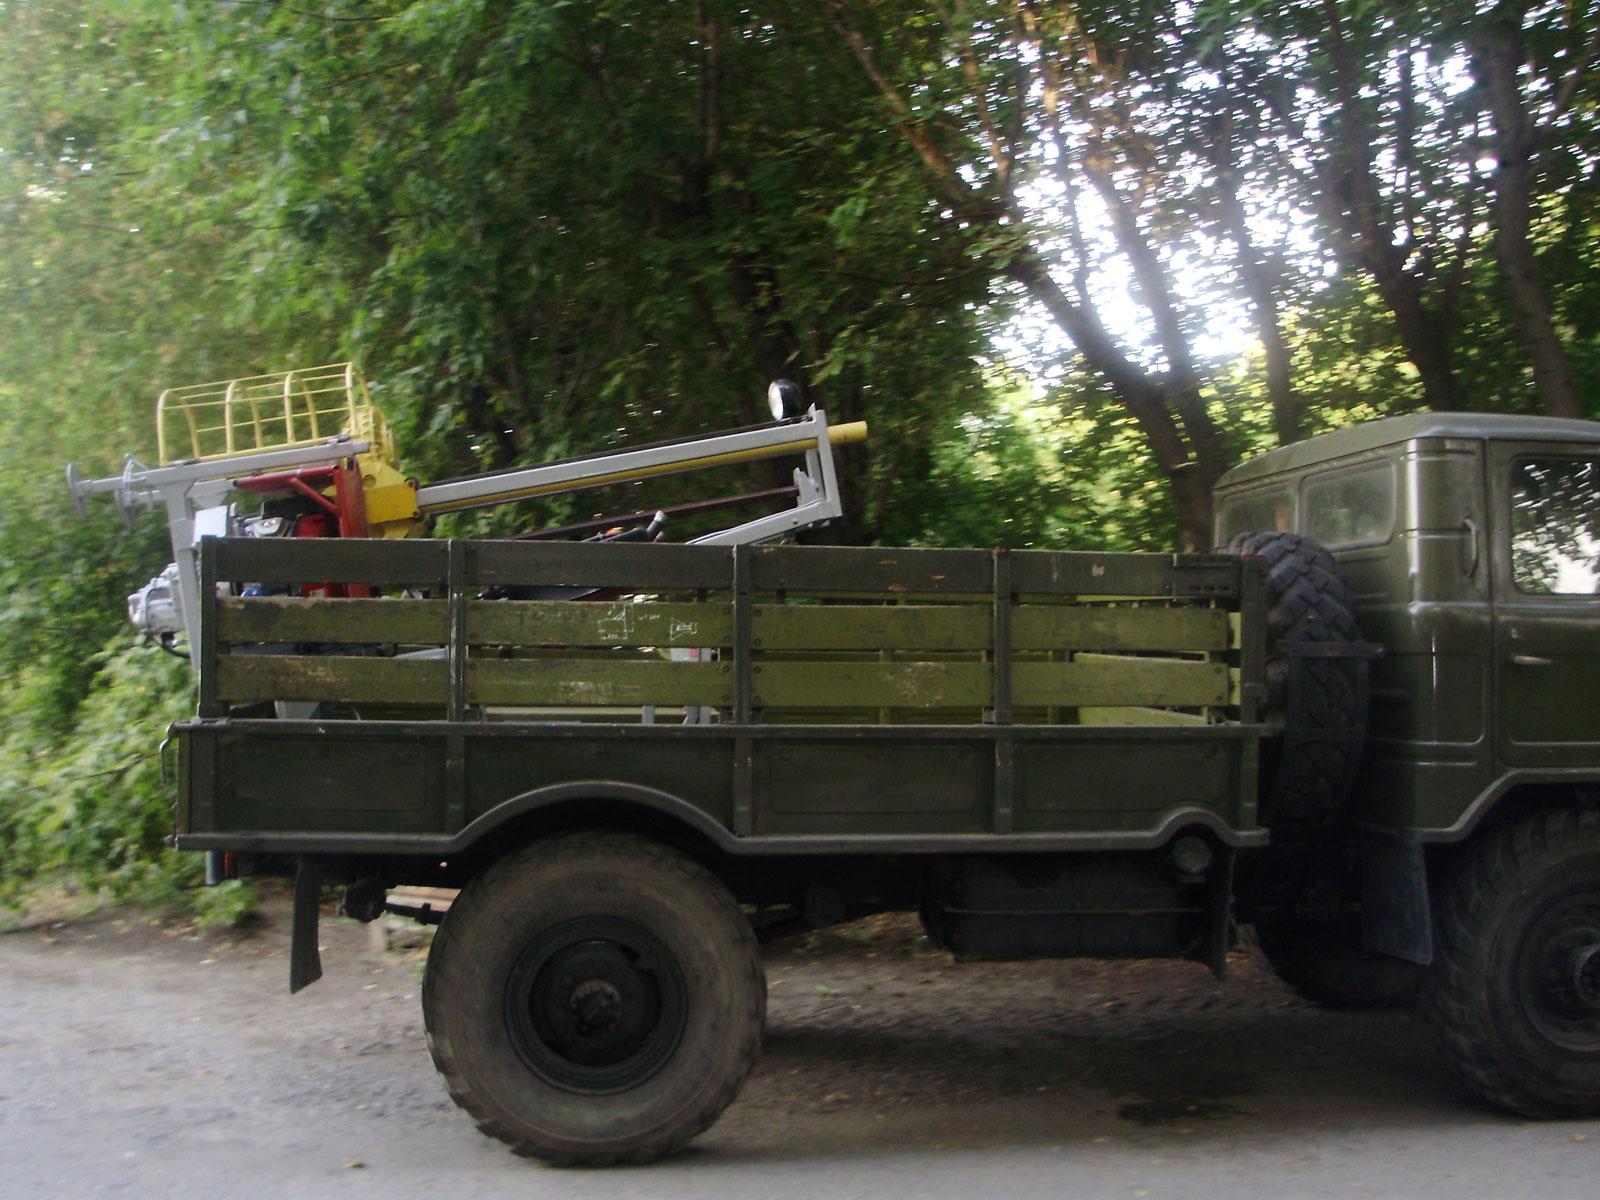 Установка буровая шнековая малогабаритная УБШМ-1-20 на базе ГАЗ-66